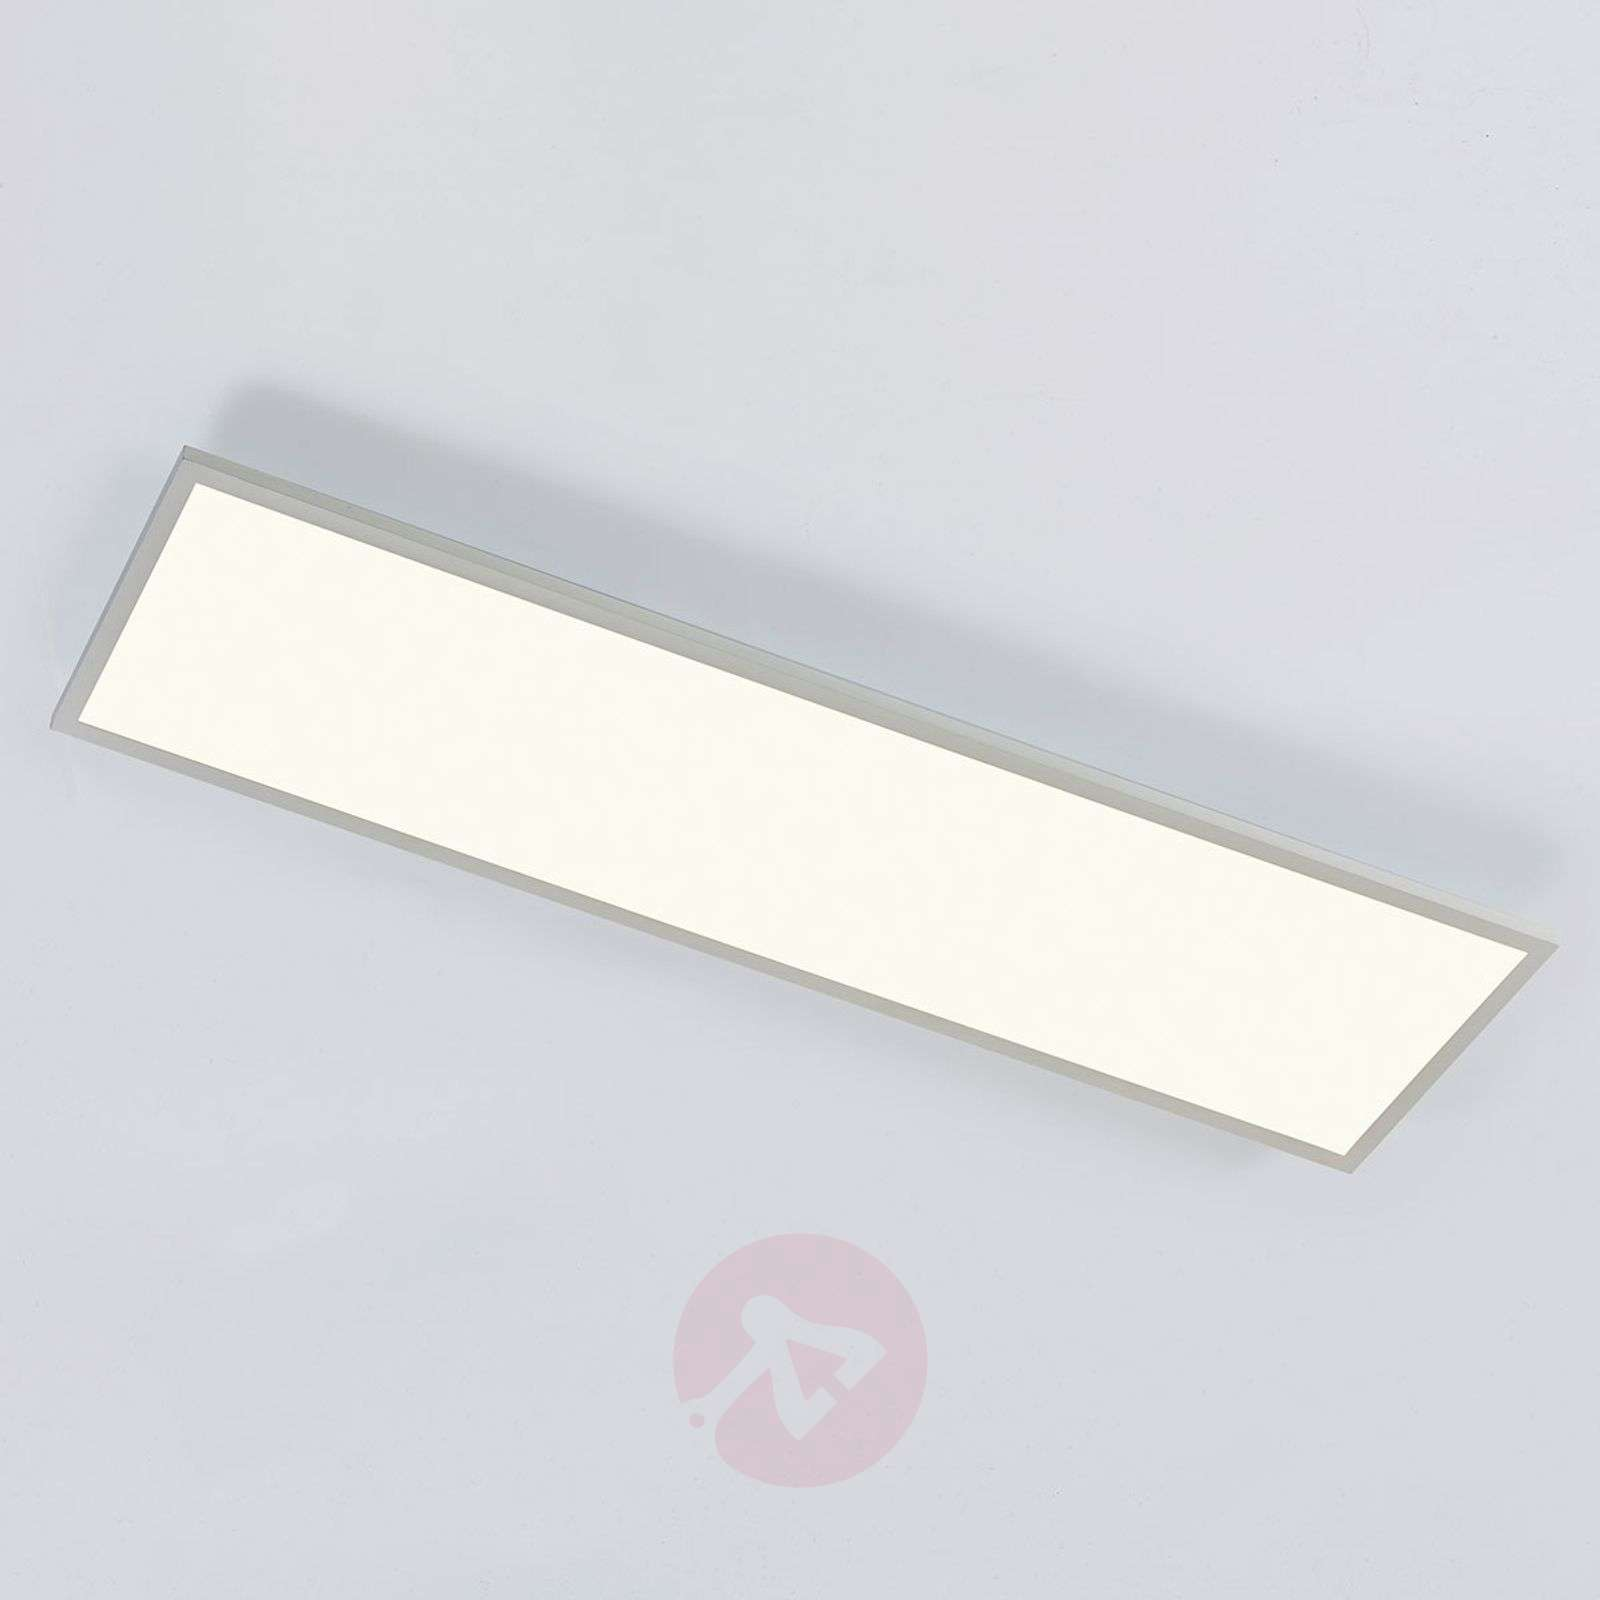 Philia – LED-kattovalaisin 3000–6000K, 120cm-9621215-02